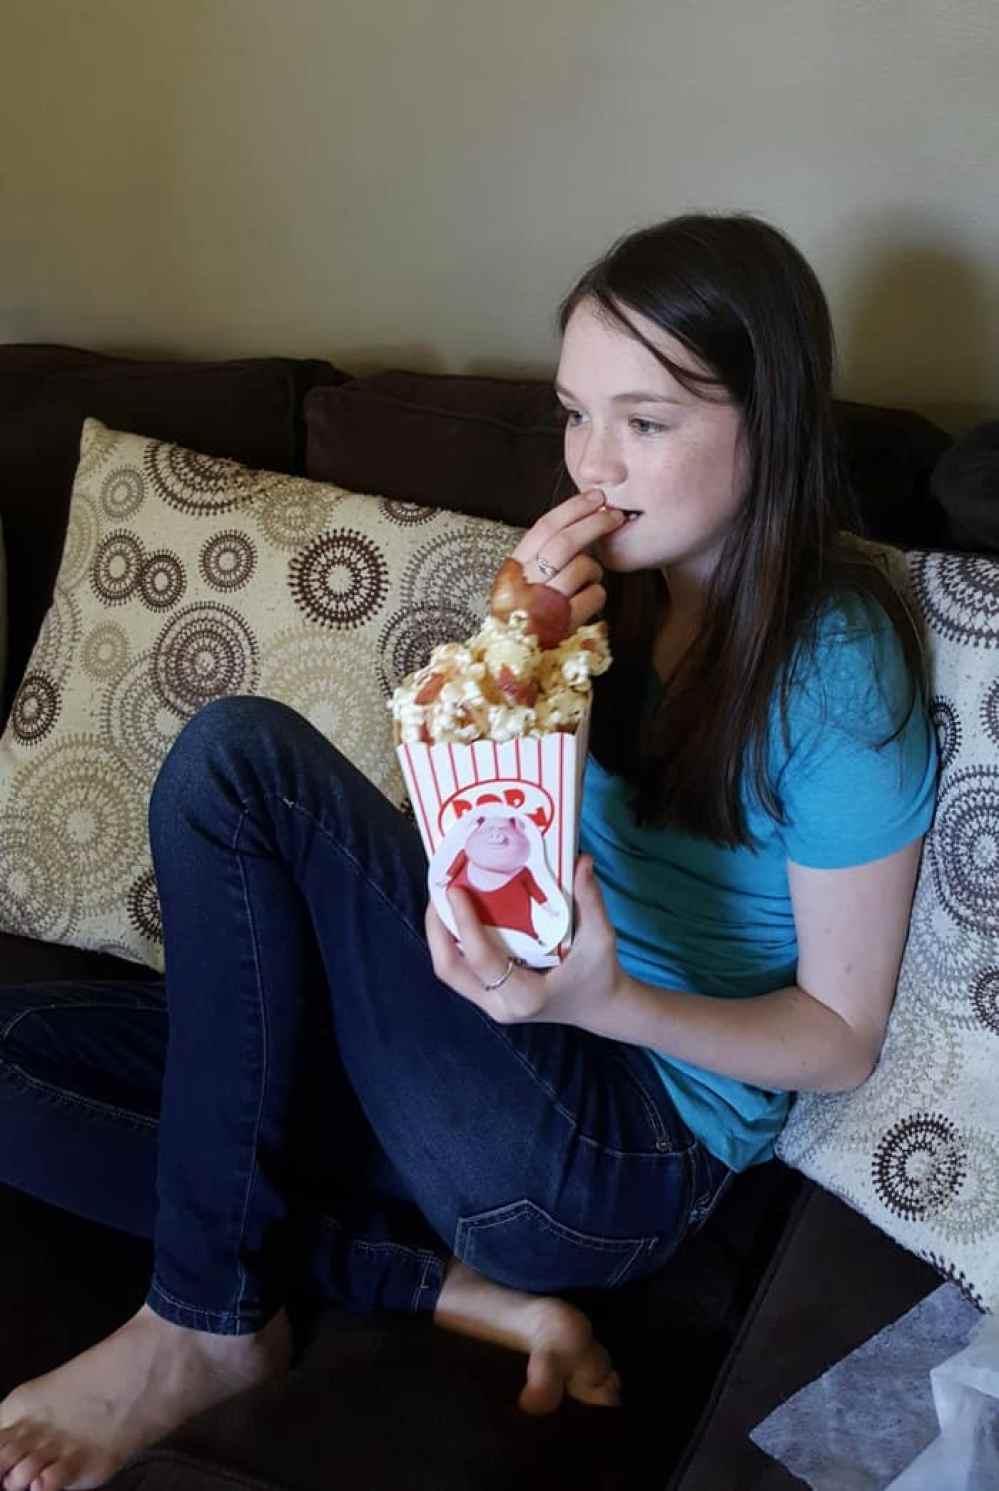 sing movie night eating piggy power popcorn